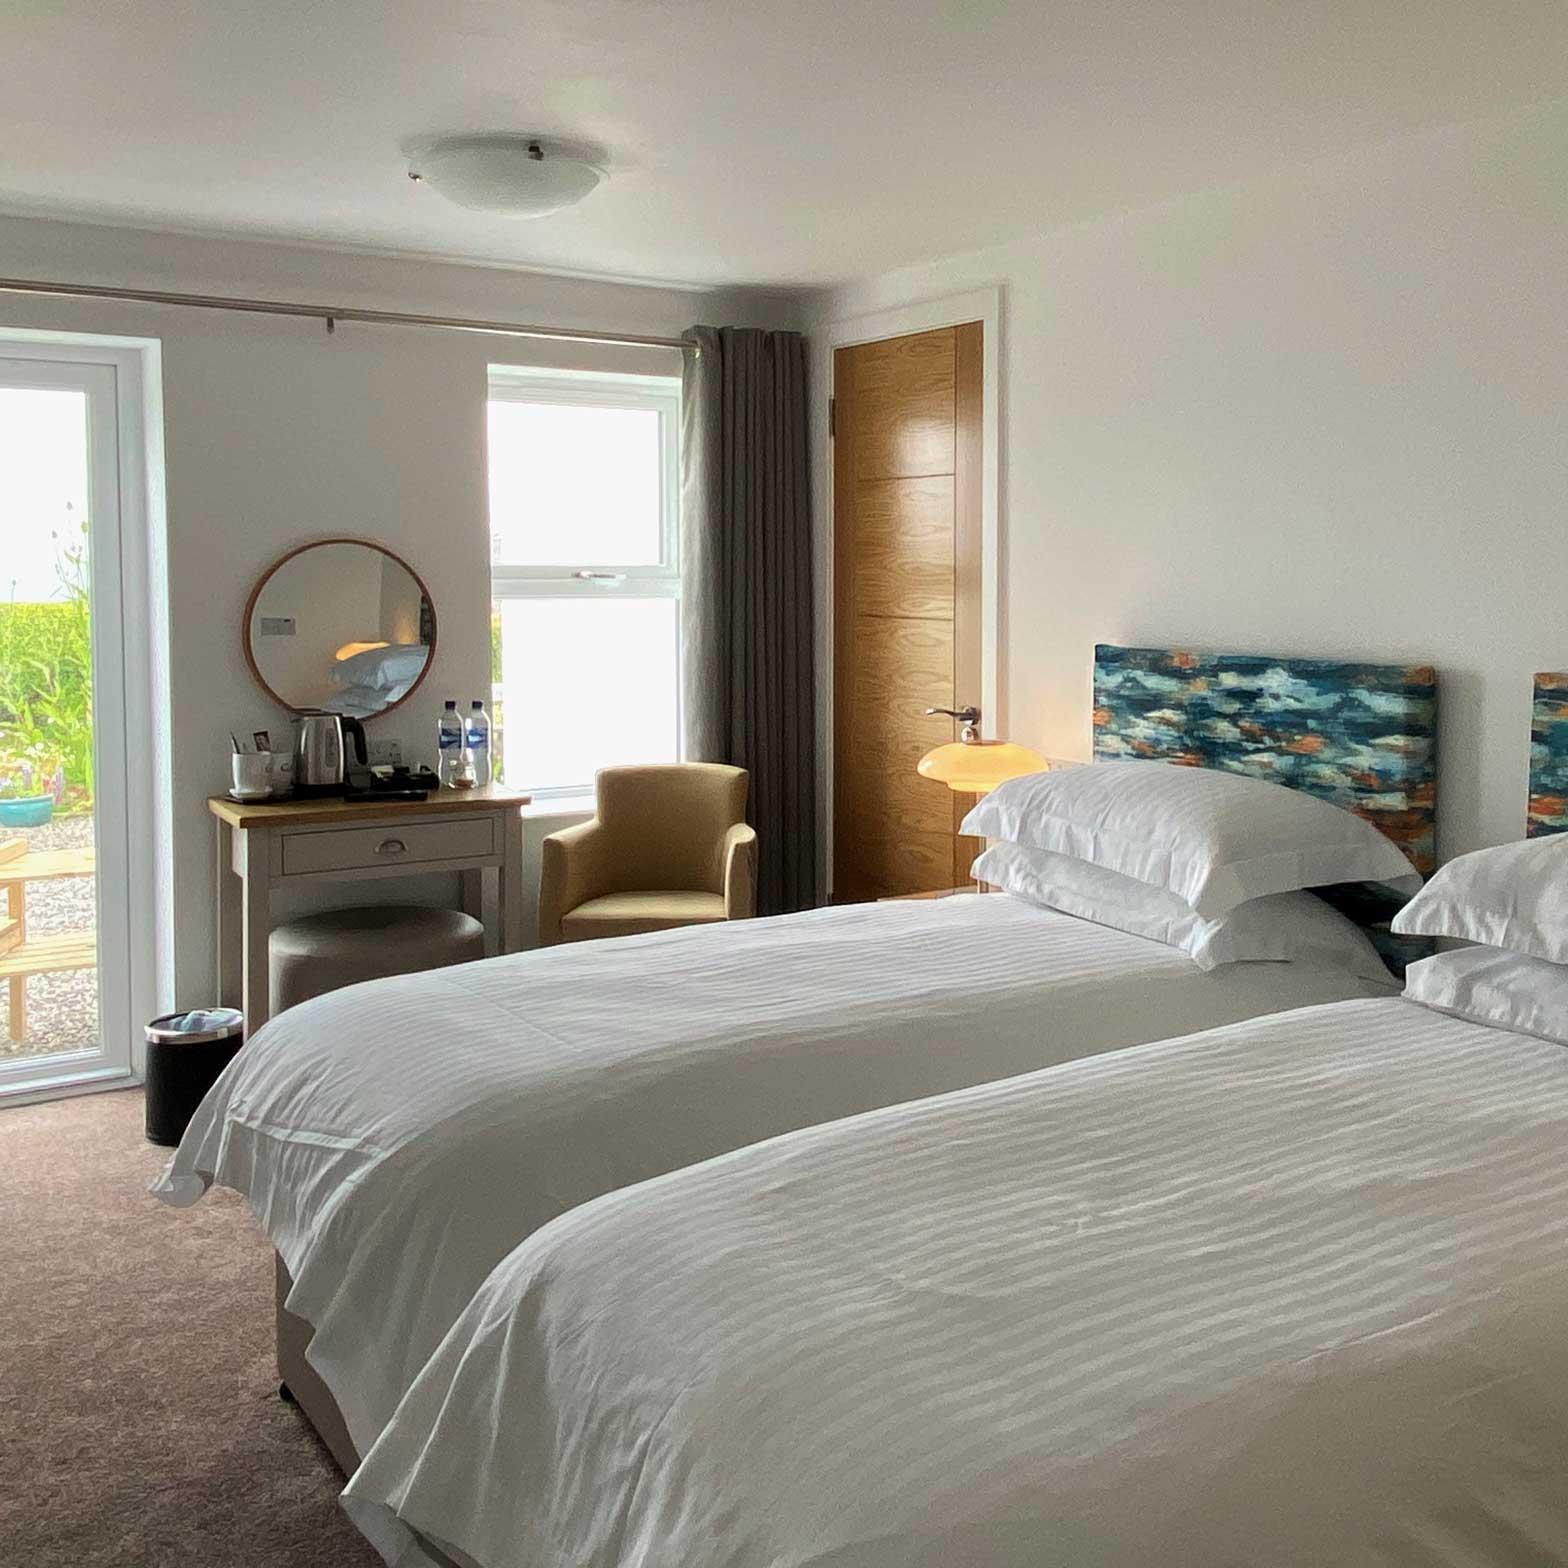 Coll Hotel bedroom